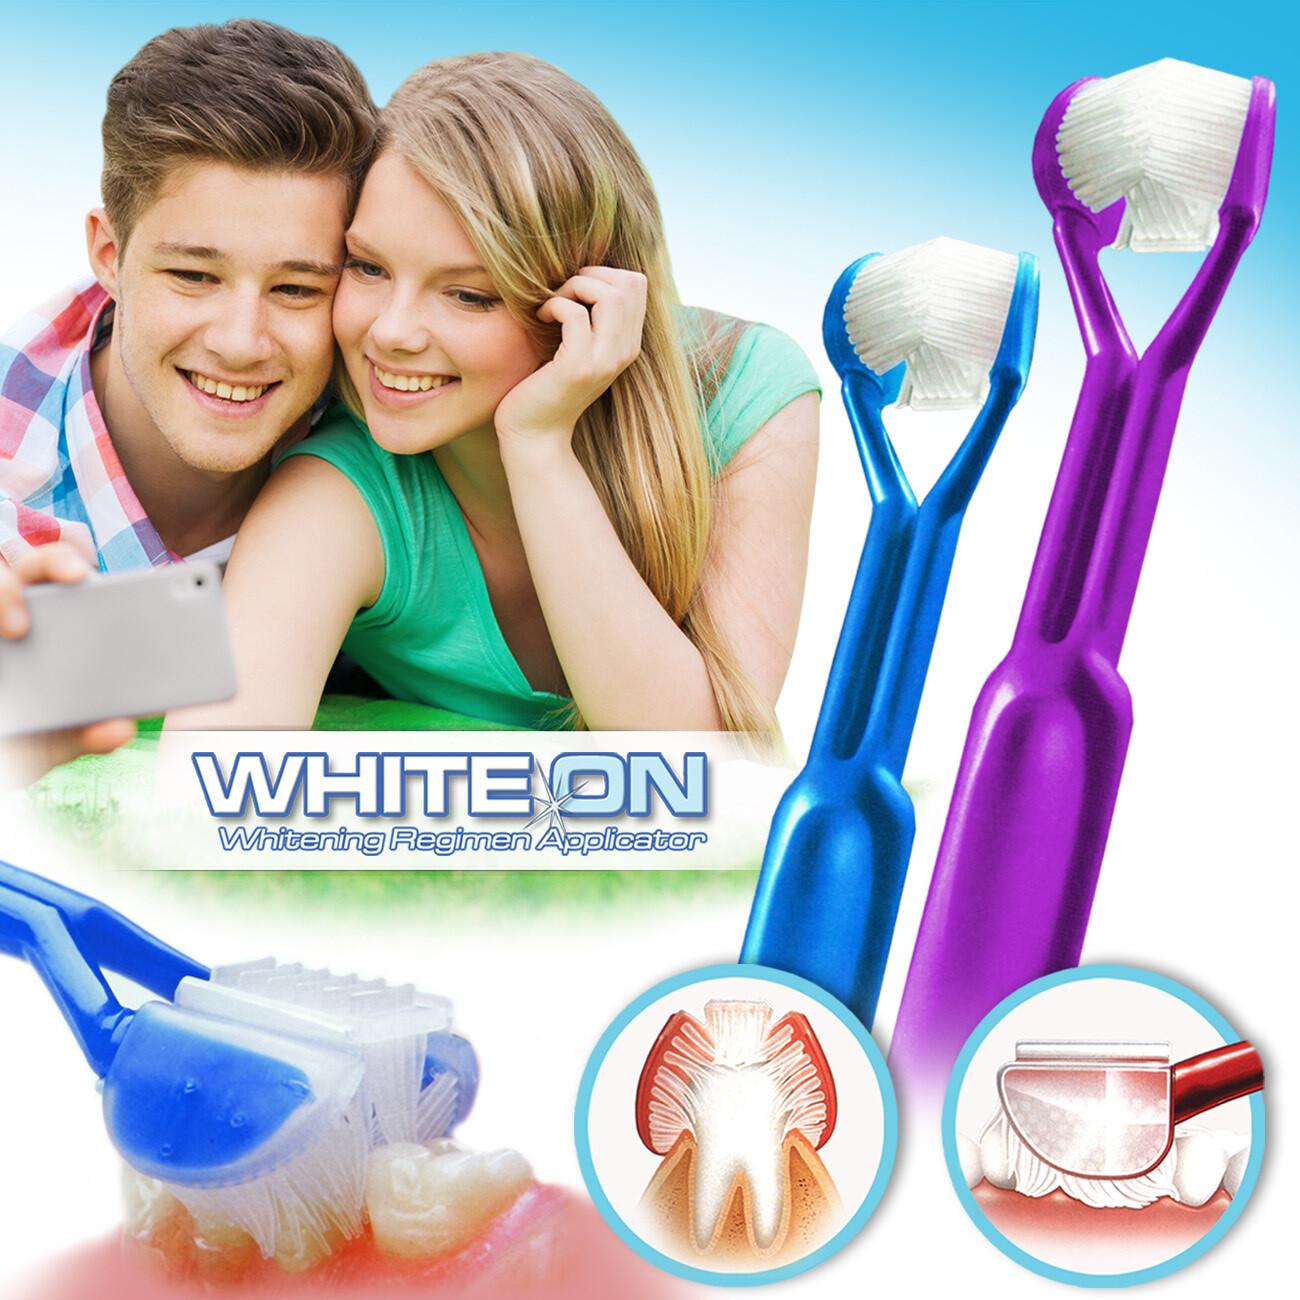 2-PK: DenTrust WHITE-ON 3-Sided Whitening Toothpaste Applicator :: Easily & Evenly Apply Whitener's - Plus, Provide Complete Dental Care at the Same Time